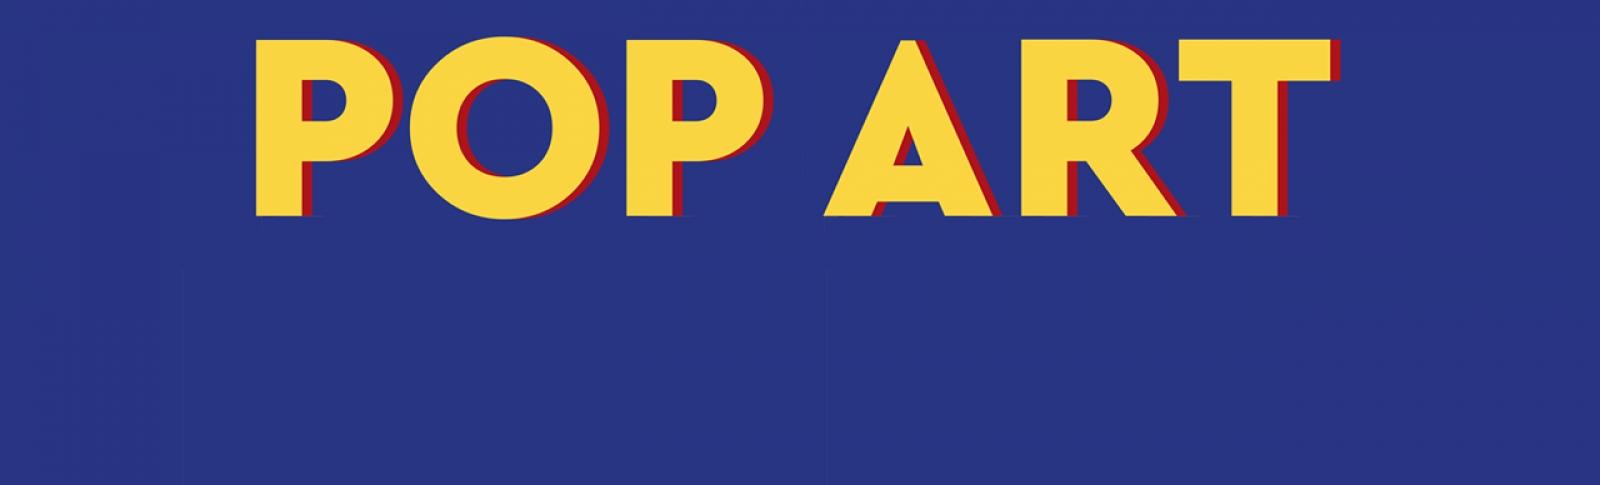 Exposition Pop Art - Icons that matter